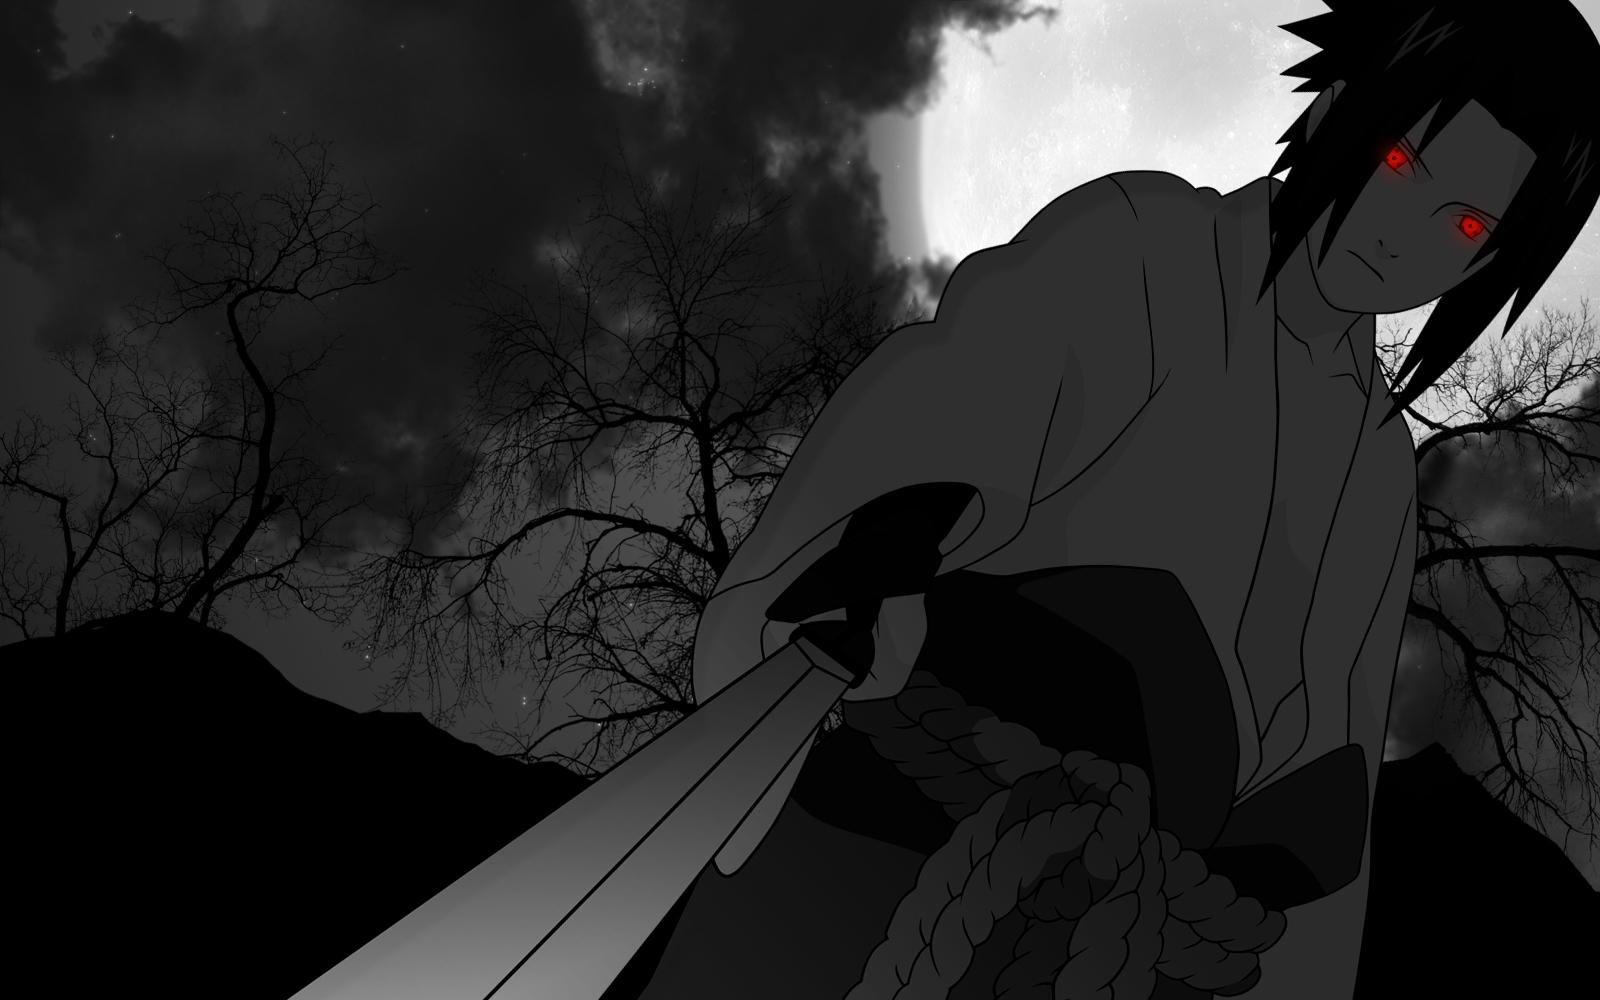 Sasuke black and white pchdwallpaper sasuke black and white pchdwallpaper pchdwallpaper voltagebd Image collections